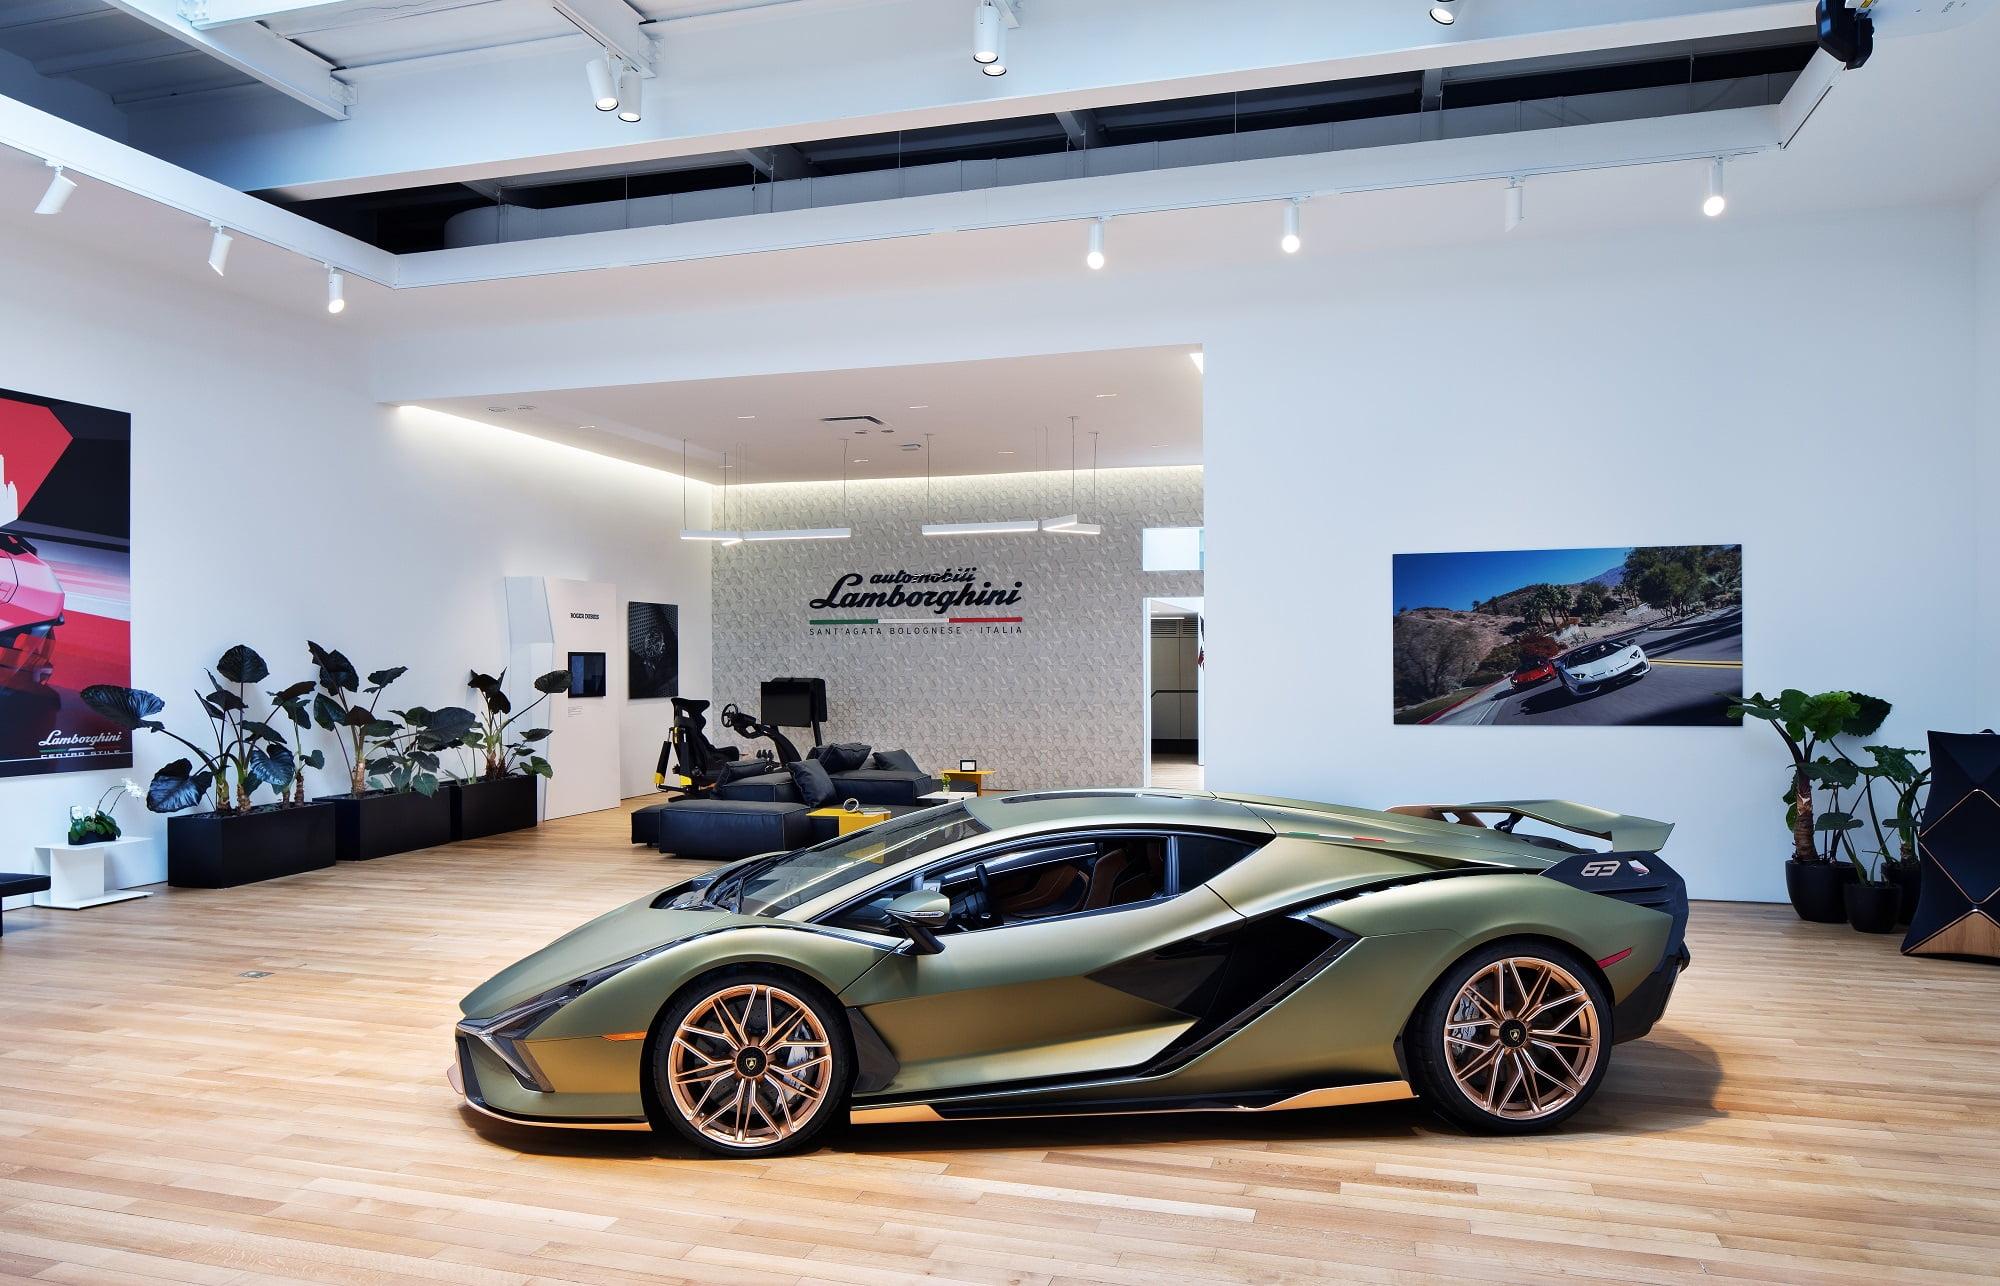 Lamborghini's New NYC Lounge